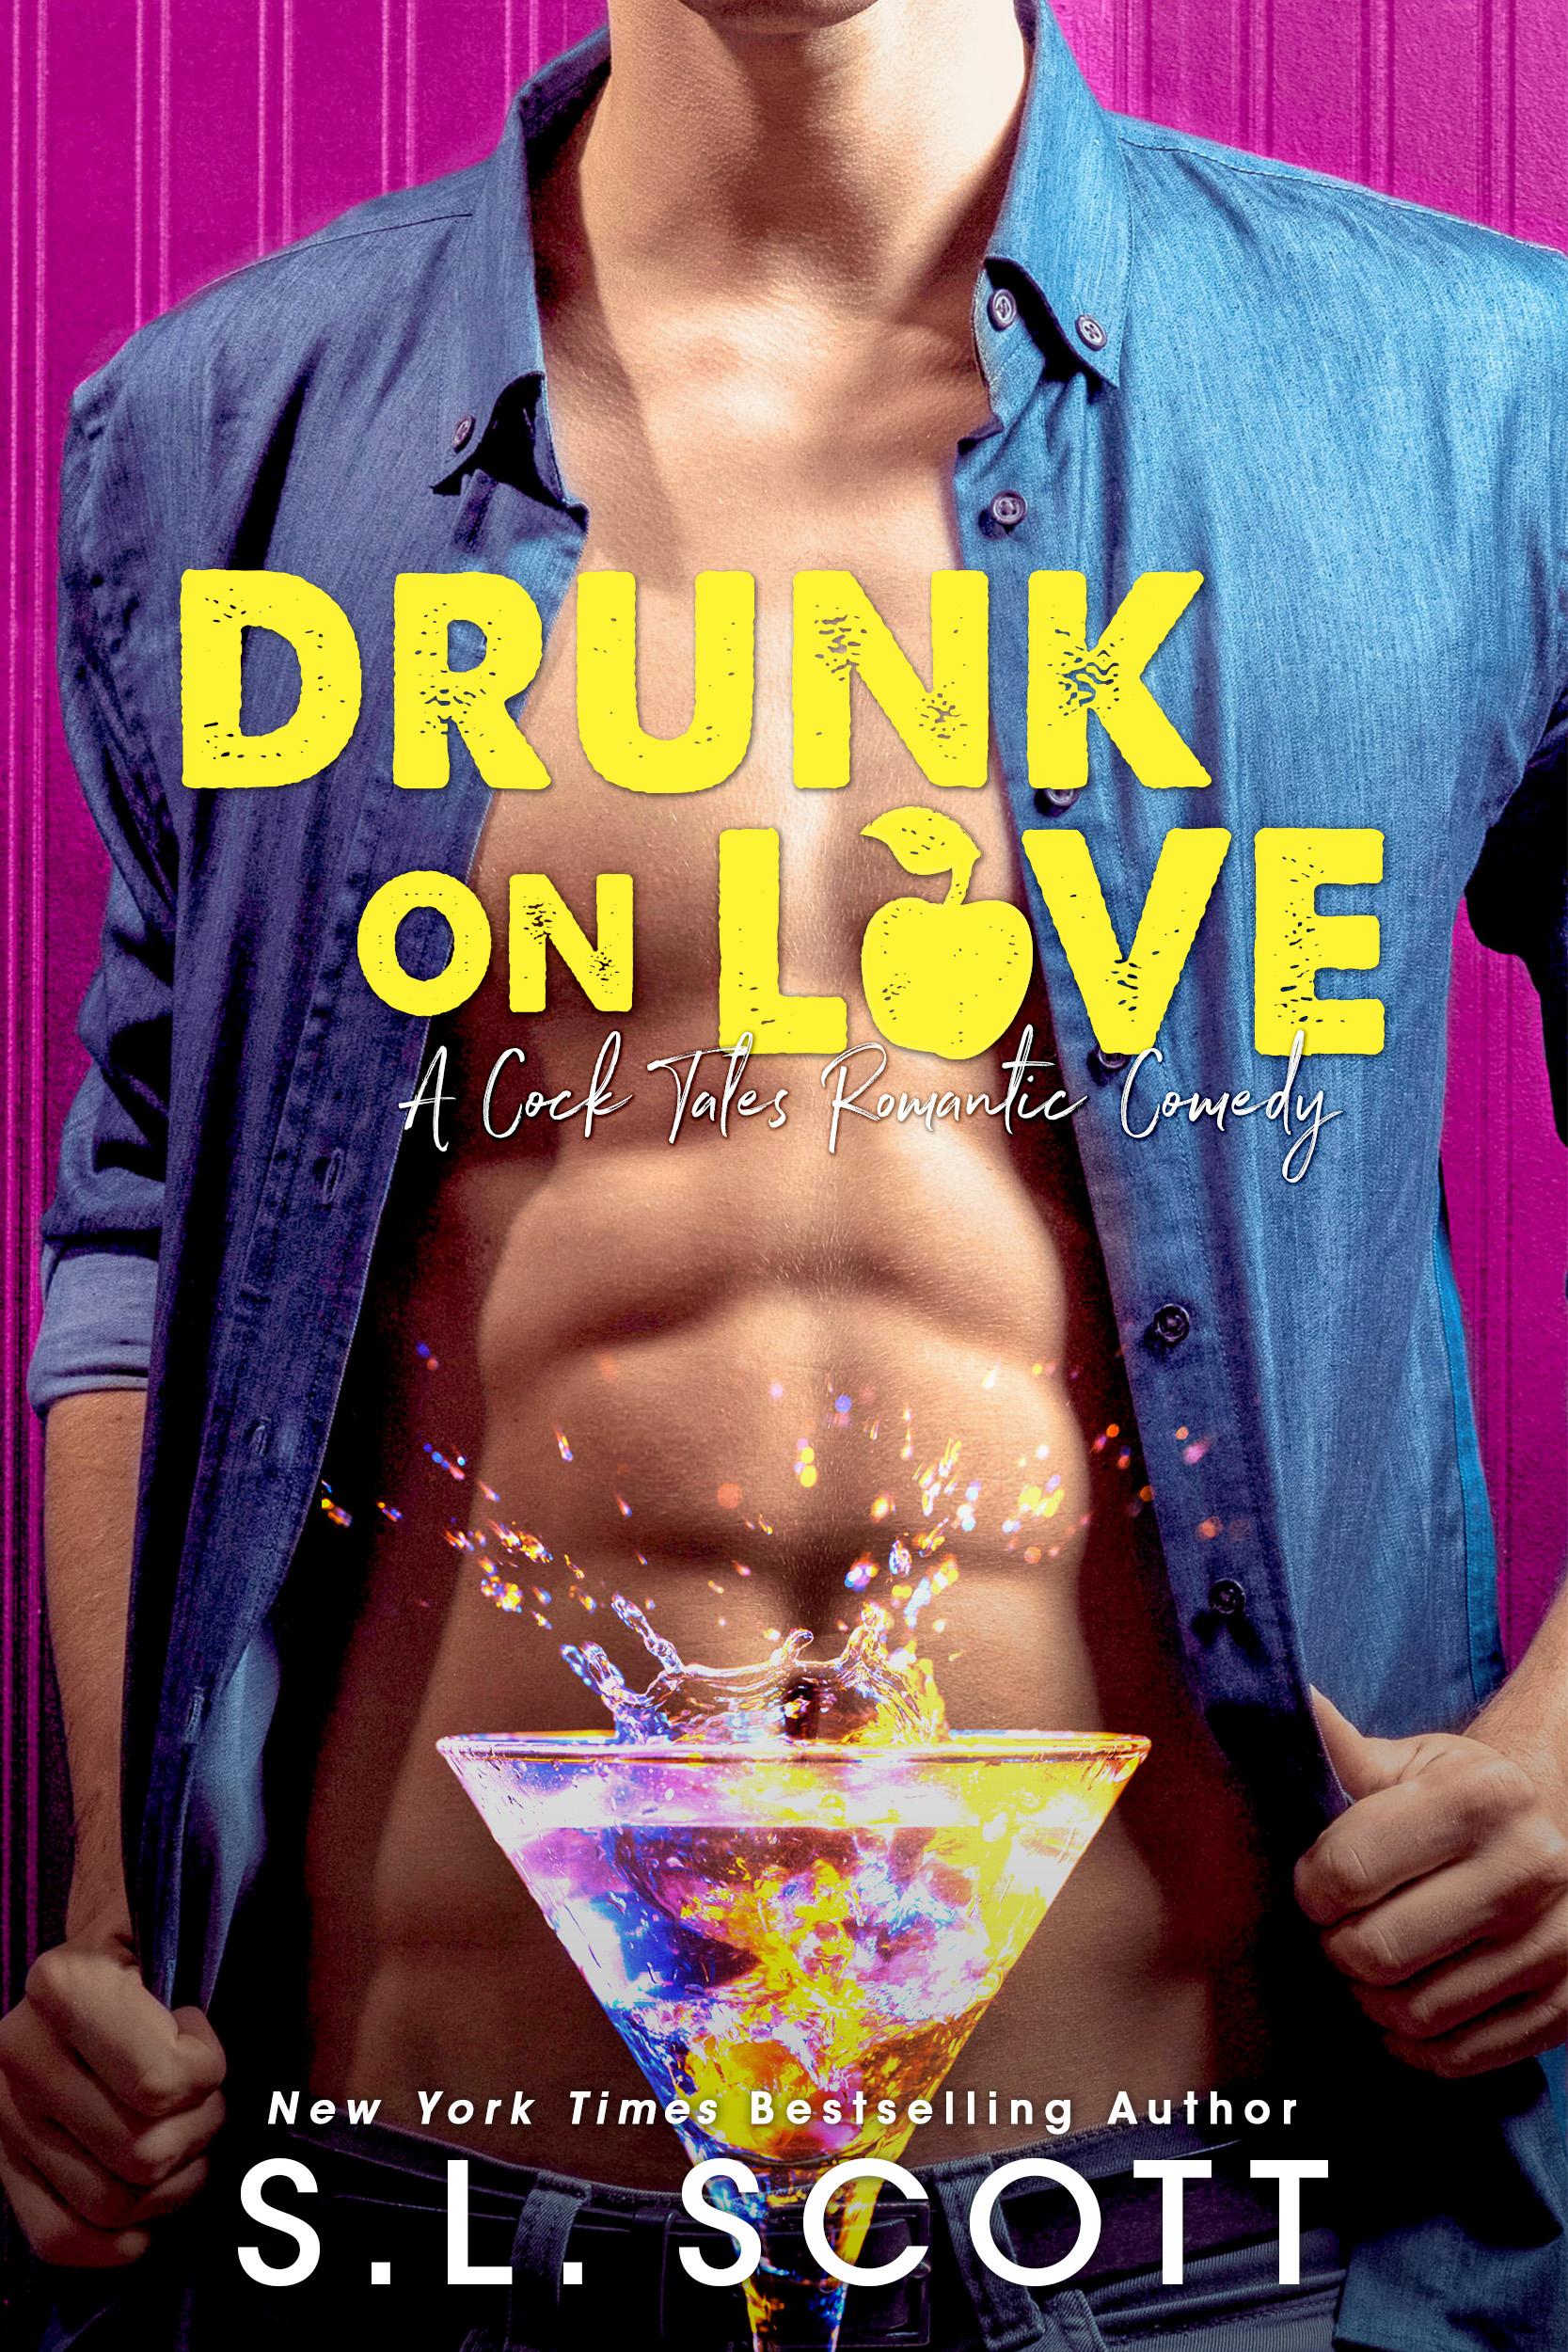 DRUNK ON LOVE Cover Ebook 2.jpg